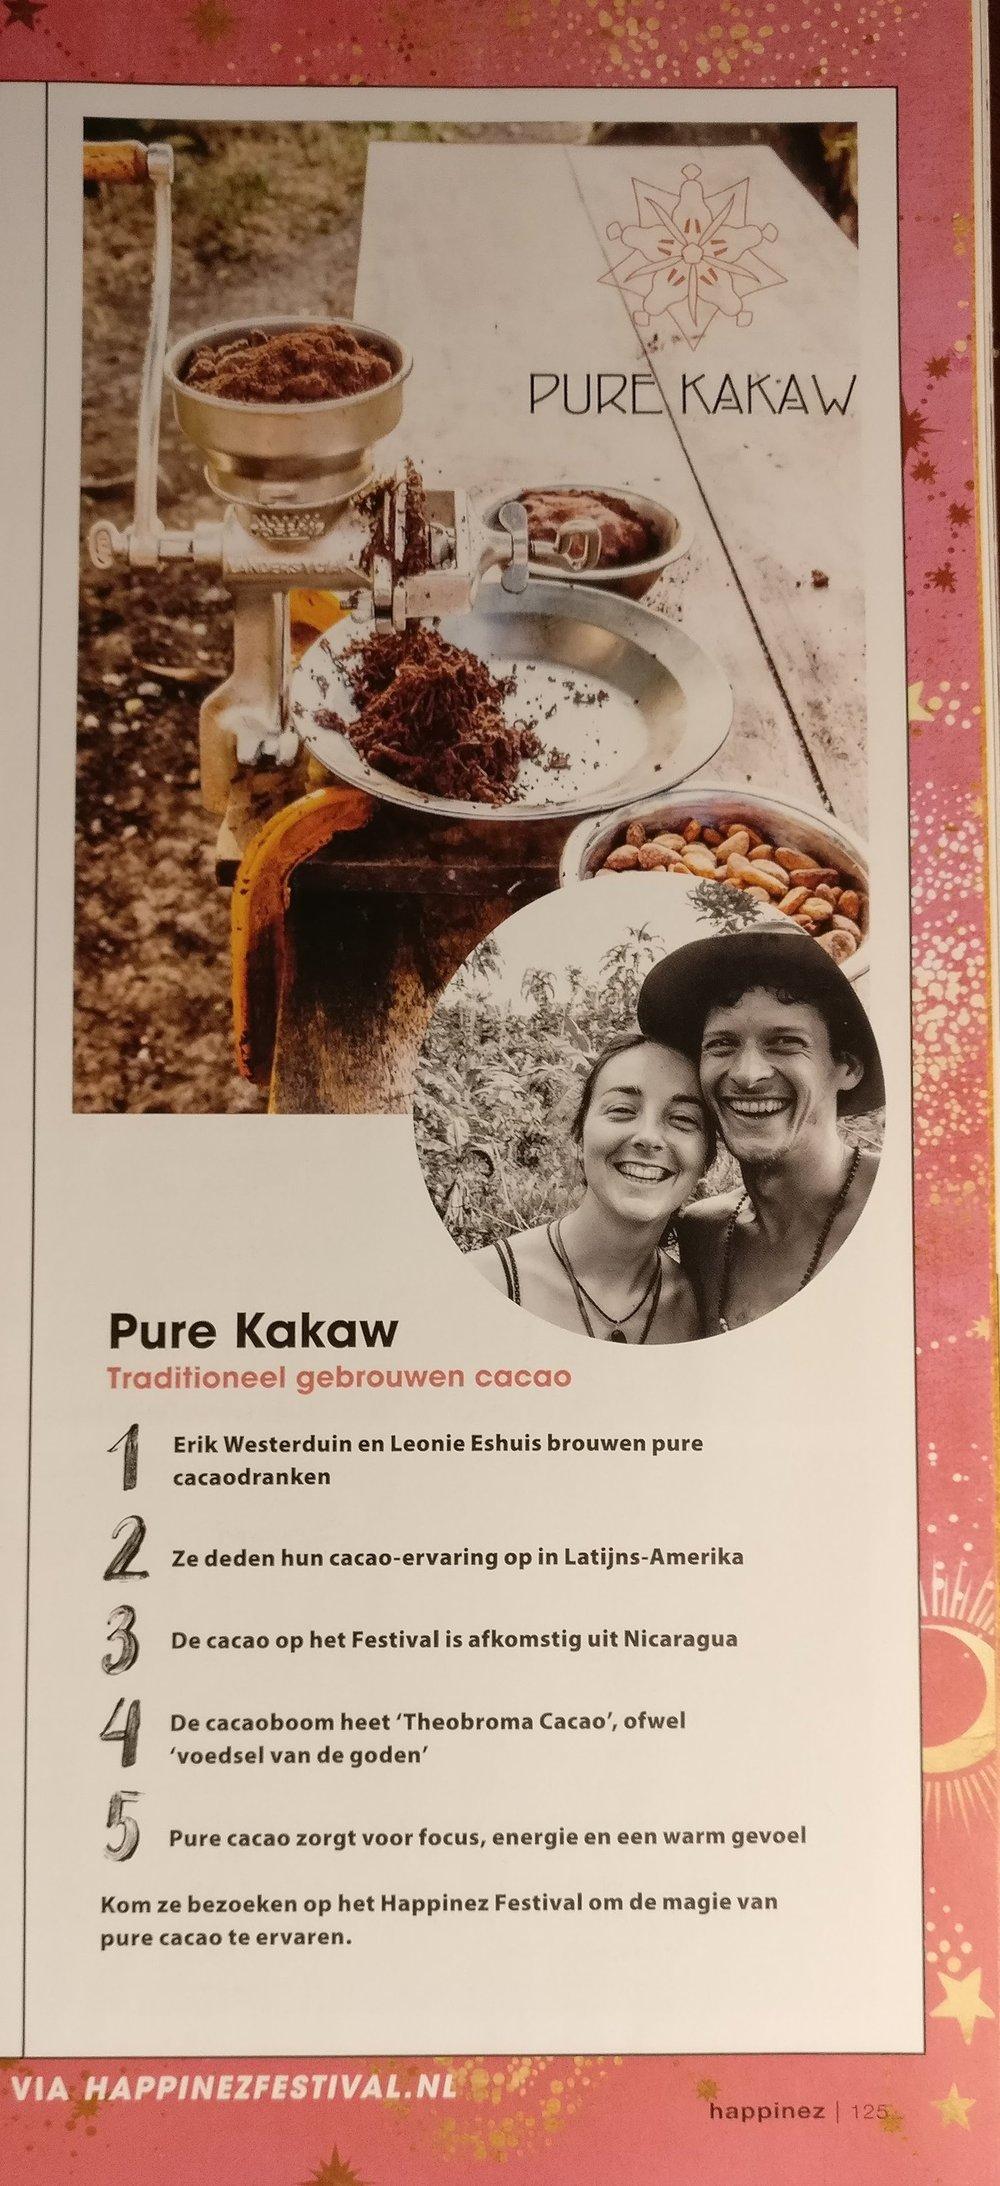 Pure-Kakaw-Happinez.jpg